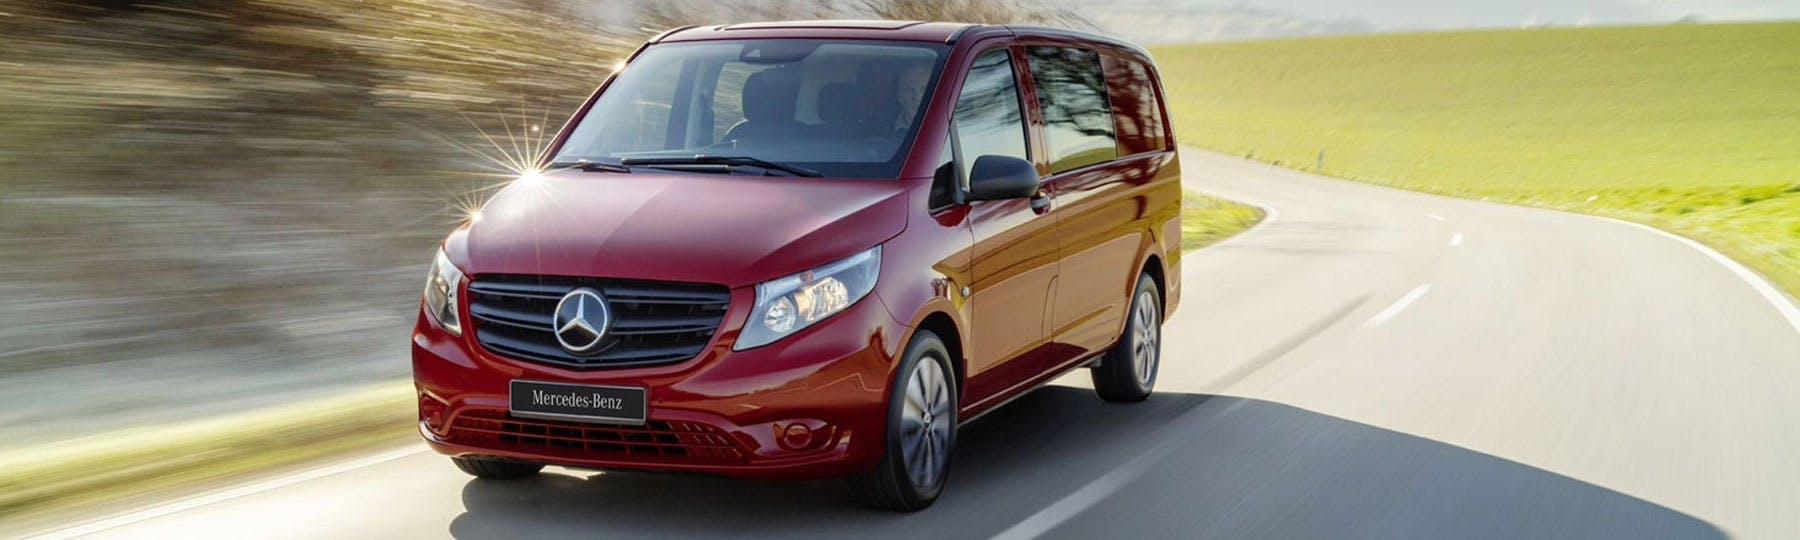 New Mercedes-Benz Vito Crew